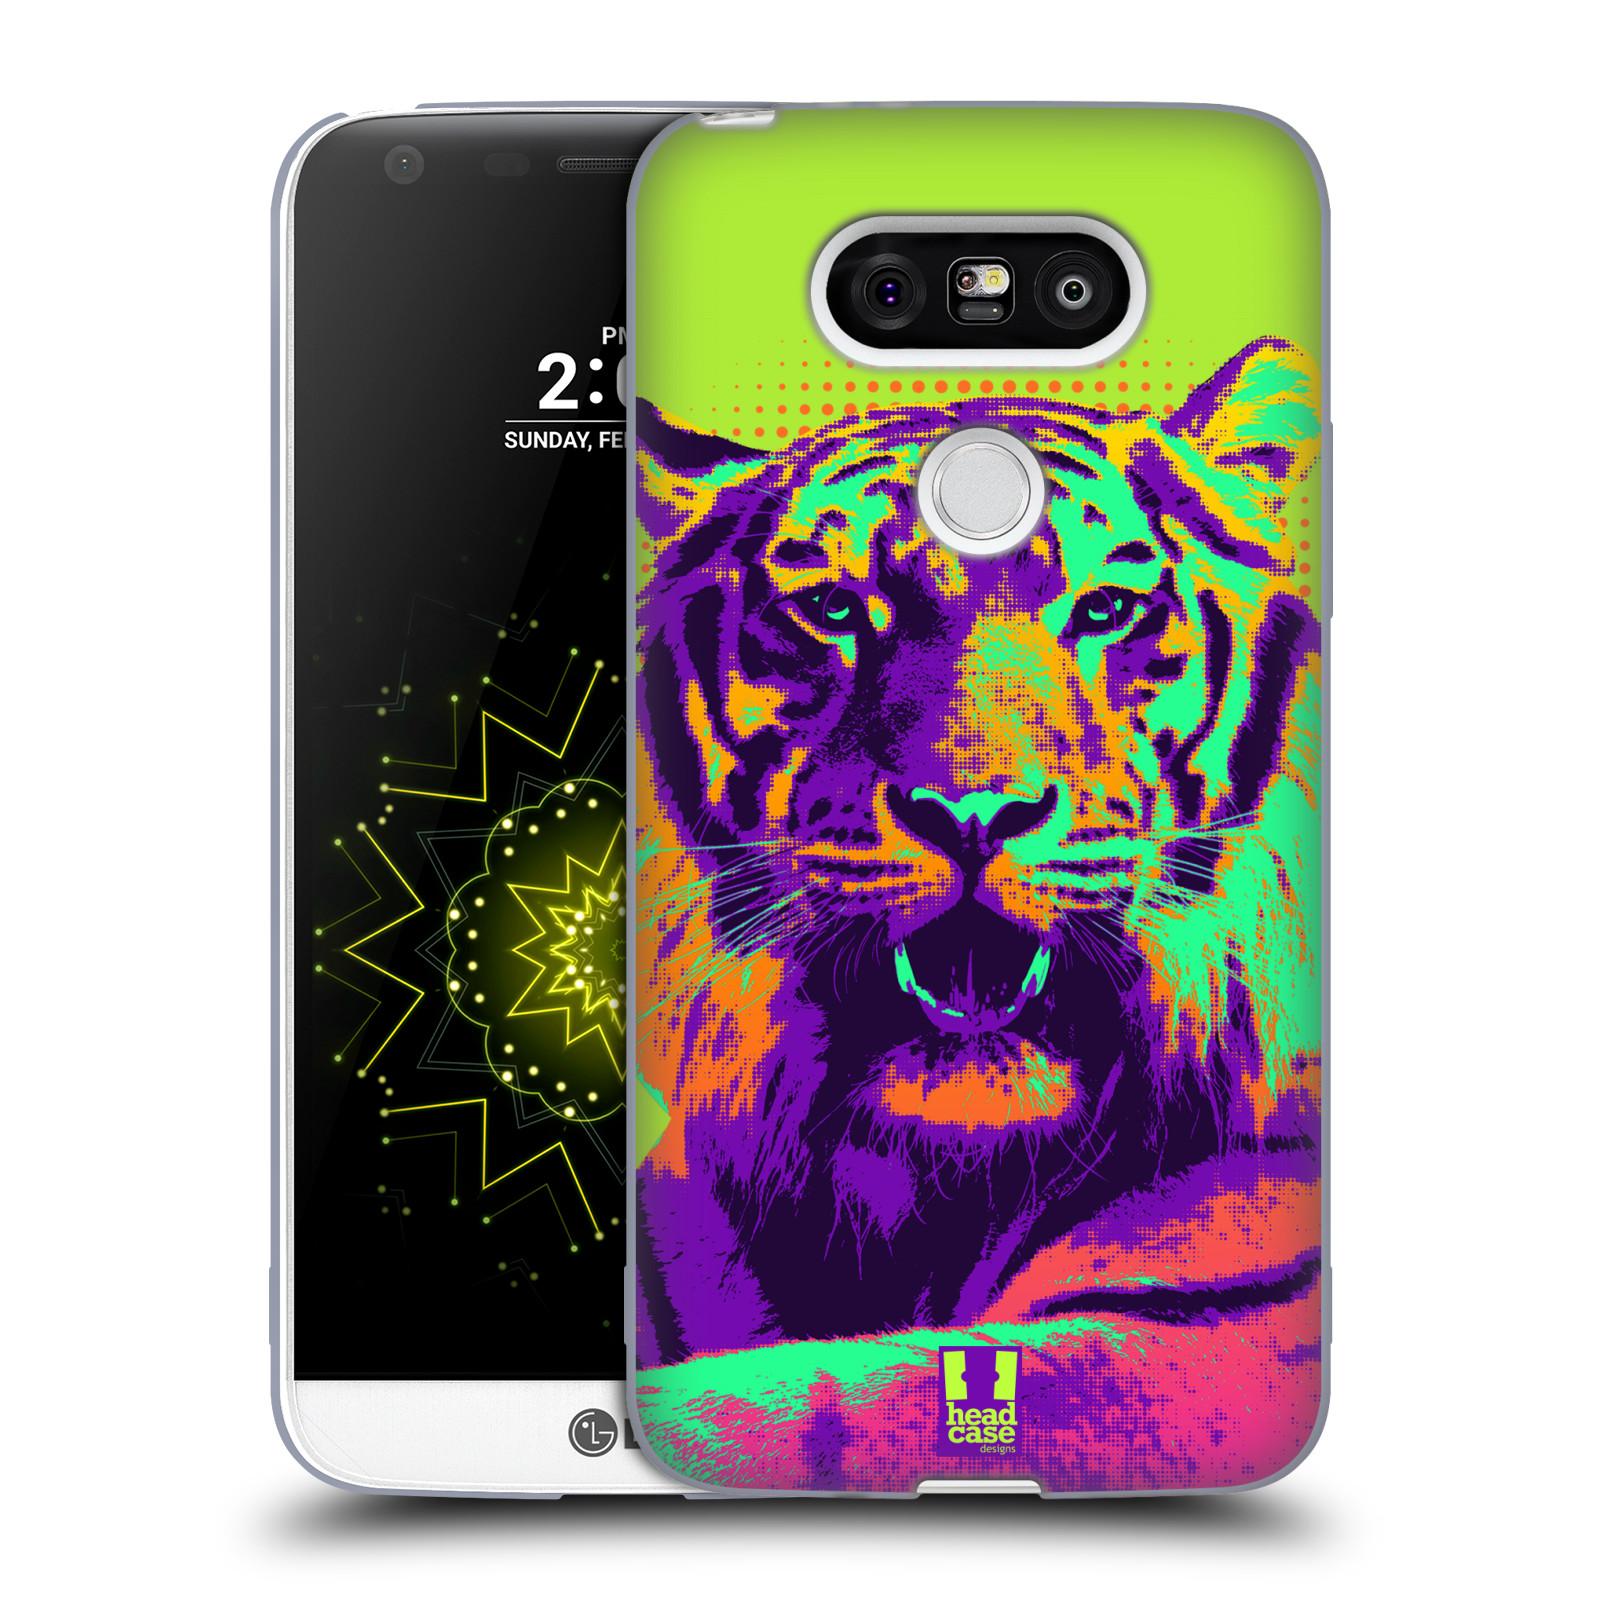 Silikonové pouzdro na mobil LG G5 HEAD CASE POP PRINT TYGR (Silikonový kryt či obal na mobilní telefon LG G5 H850)